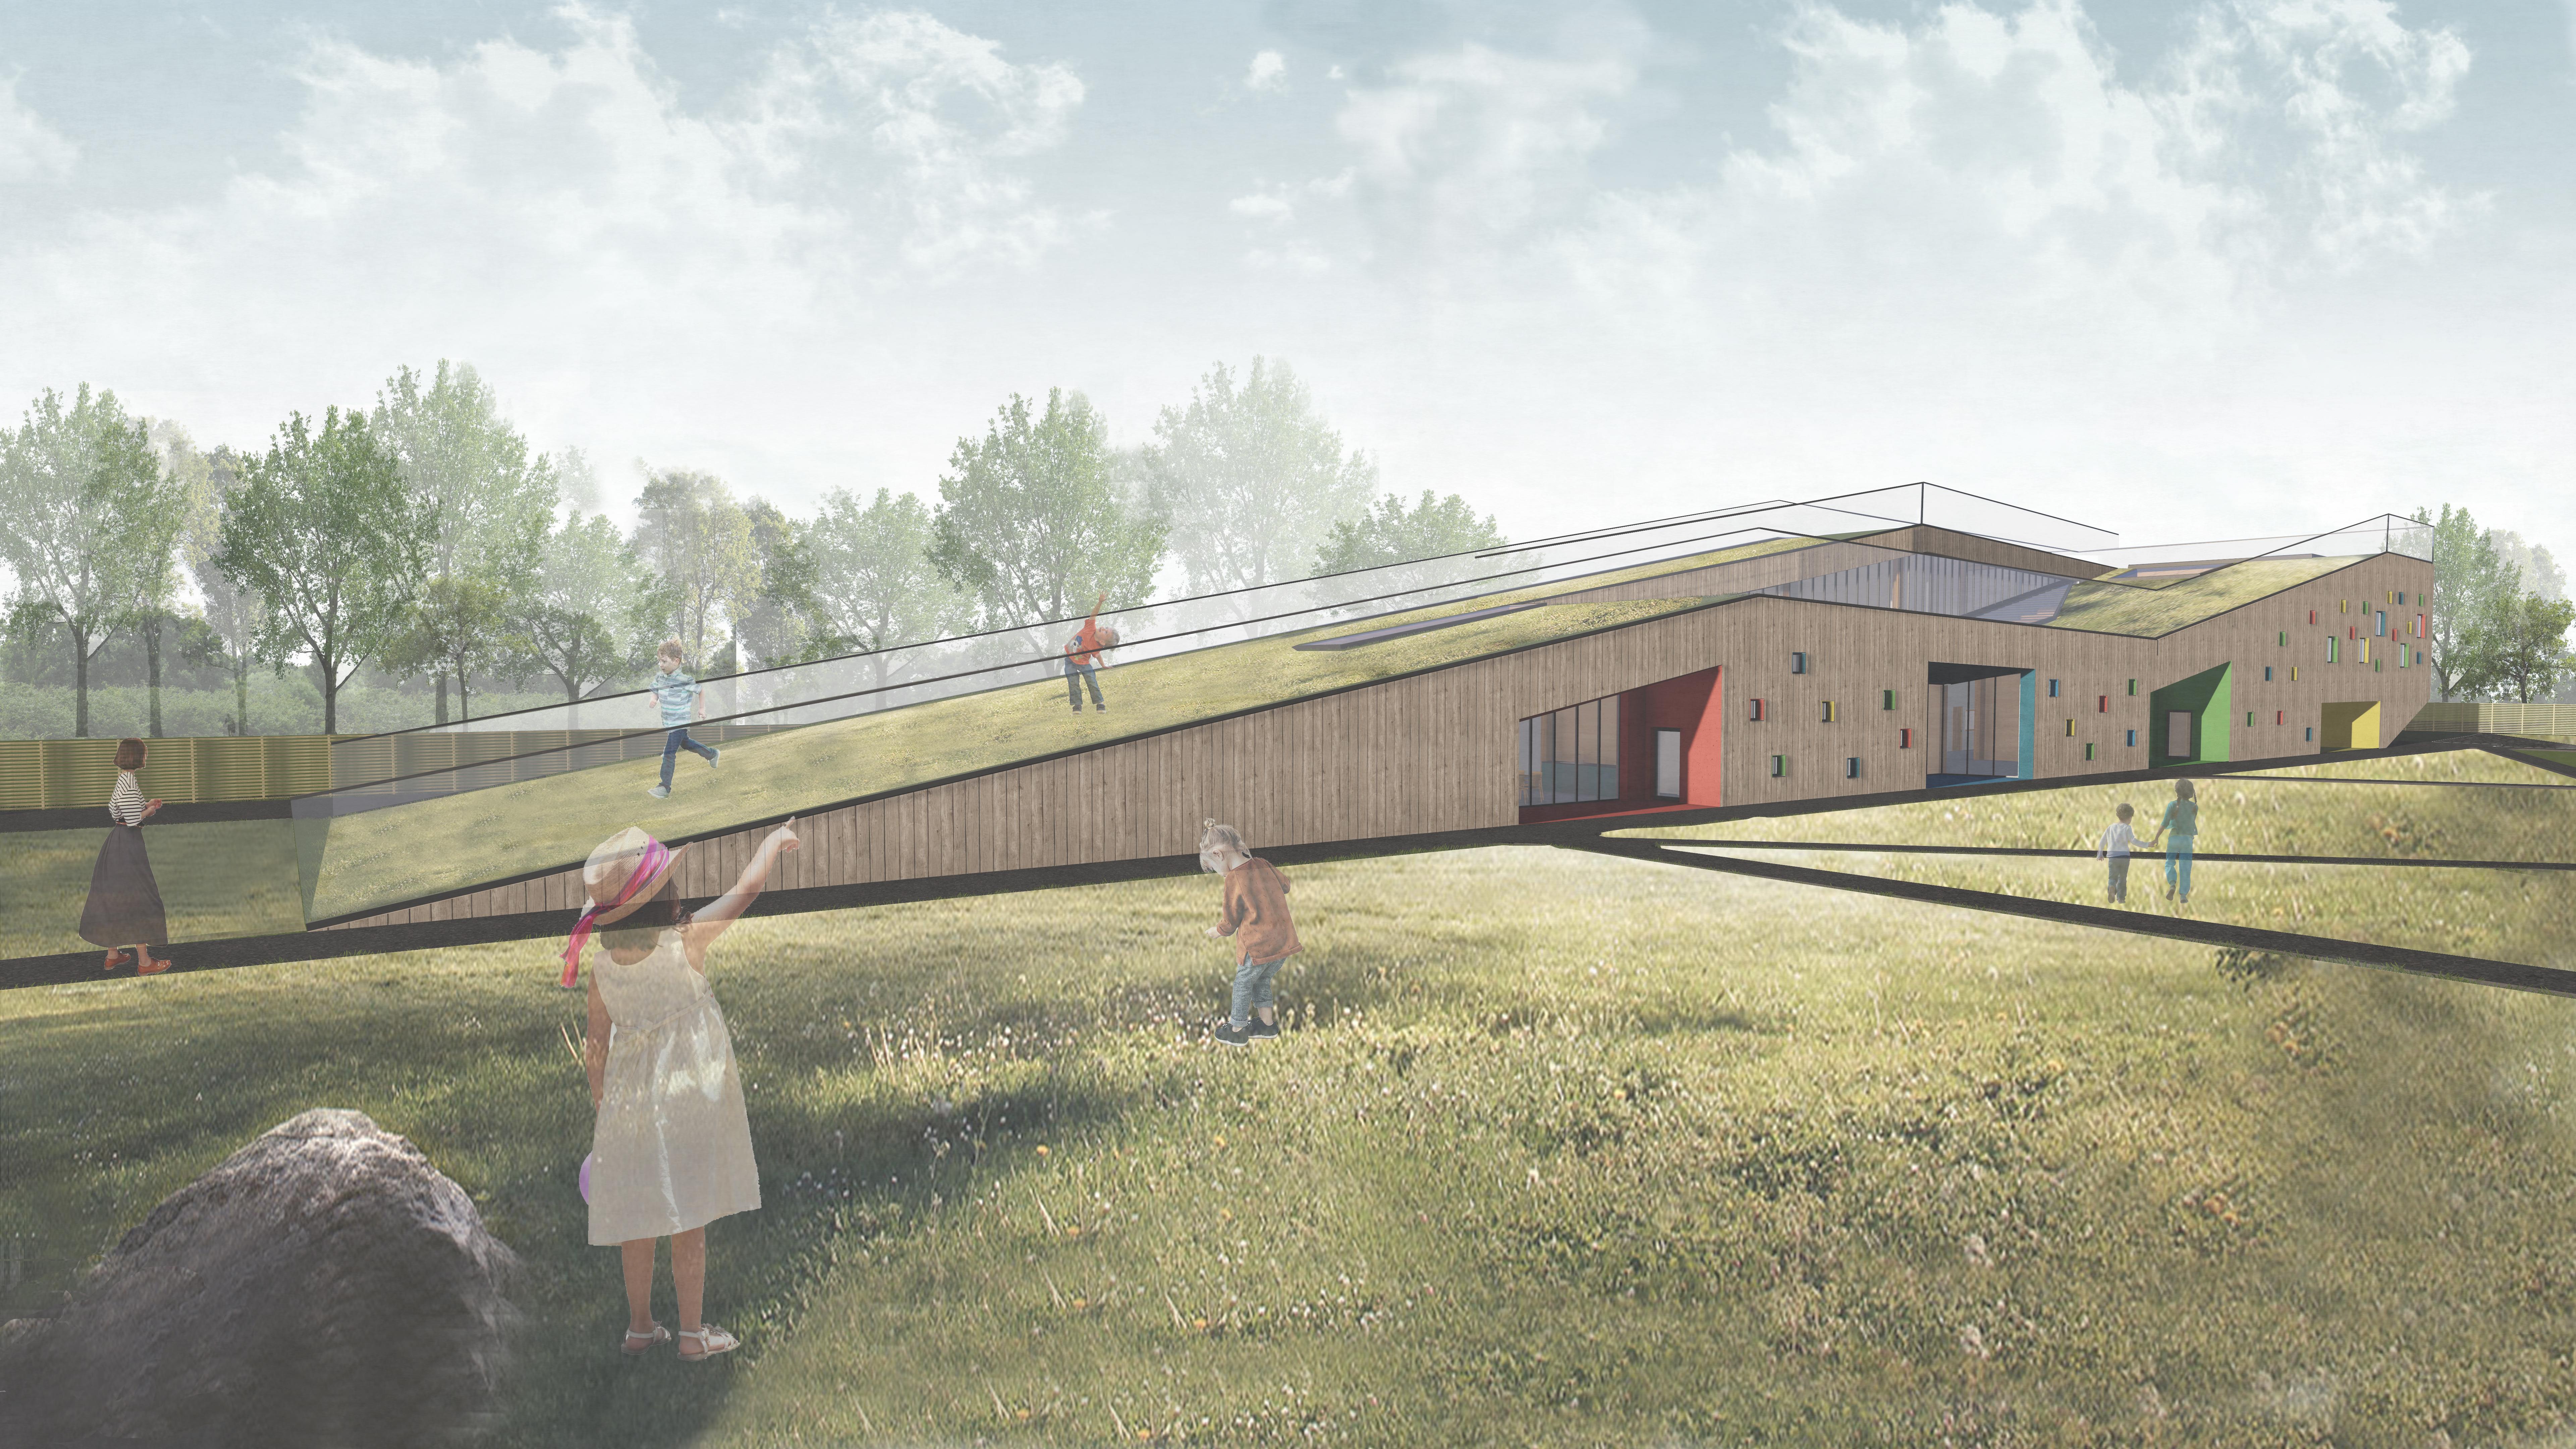 verejnost drevene stavby velke materska skola